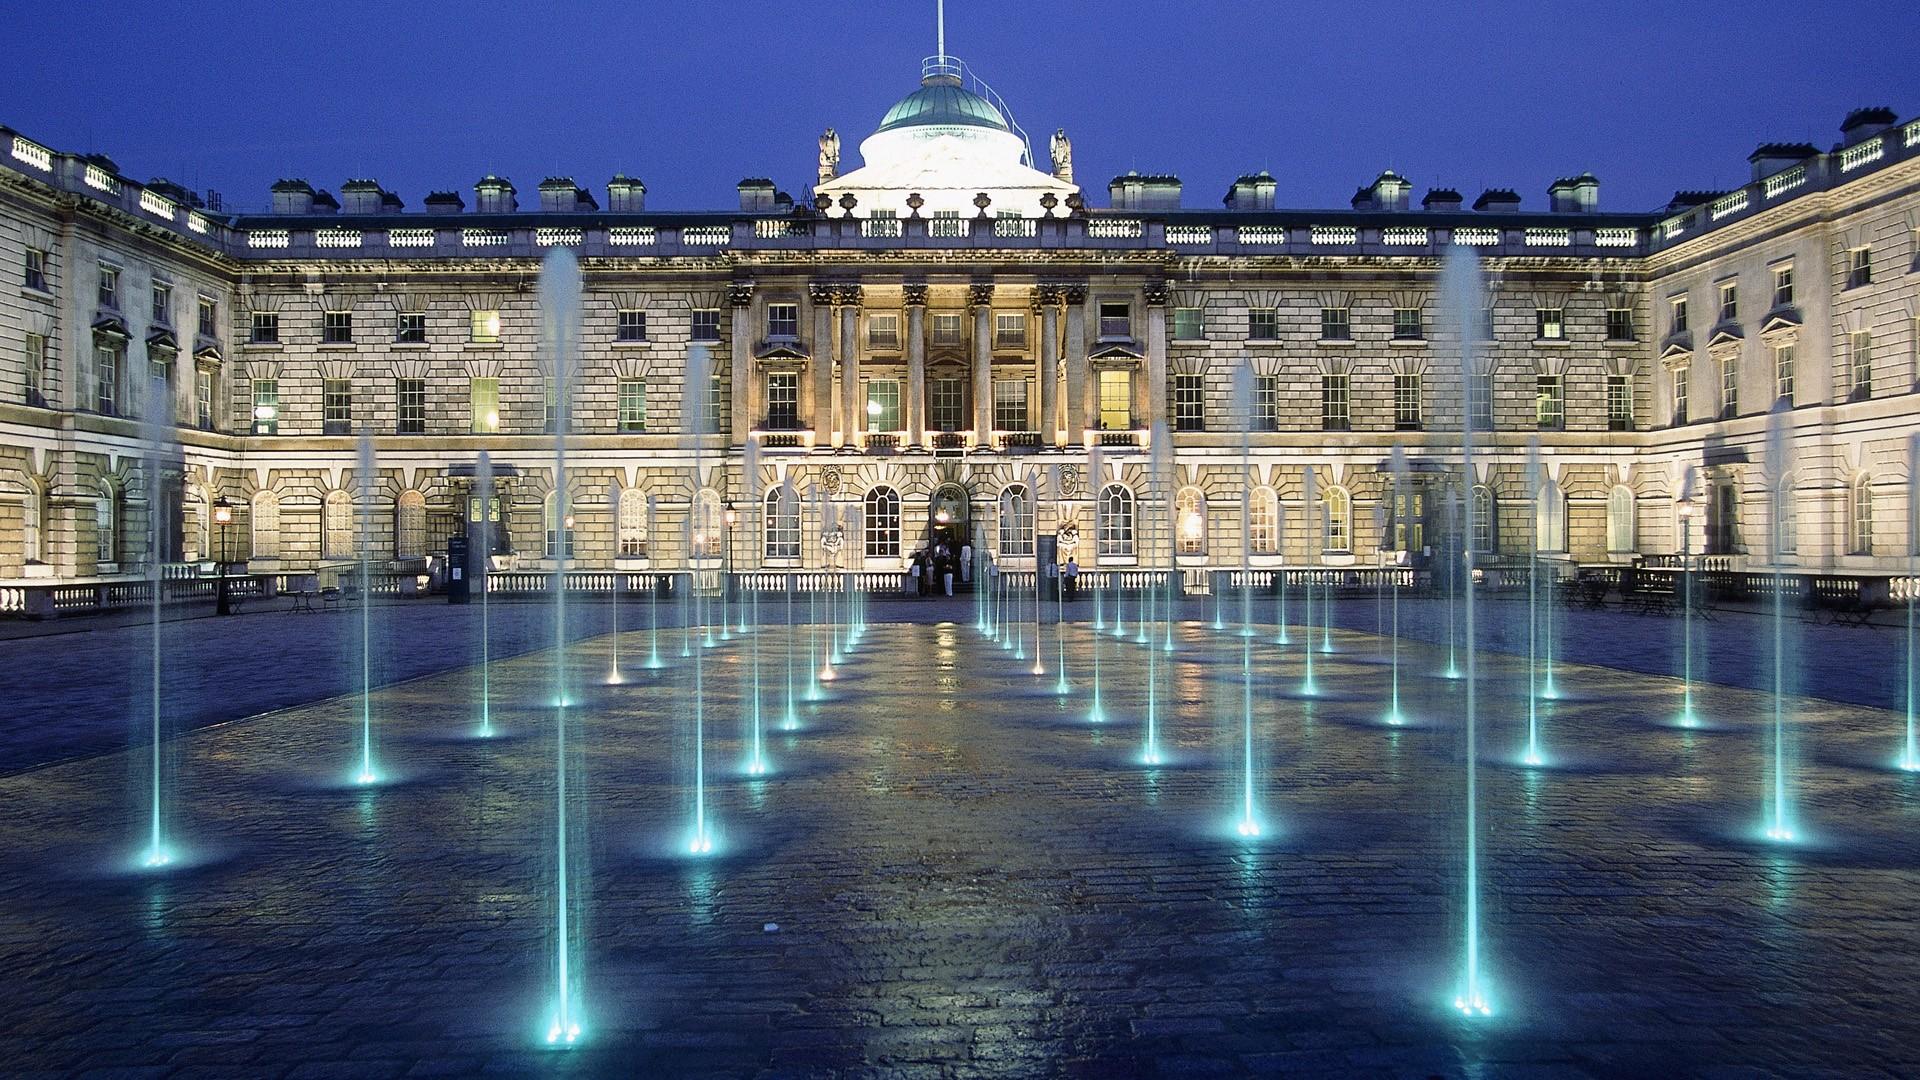 Somerset House, London, England - Wallpaper #36661